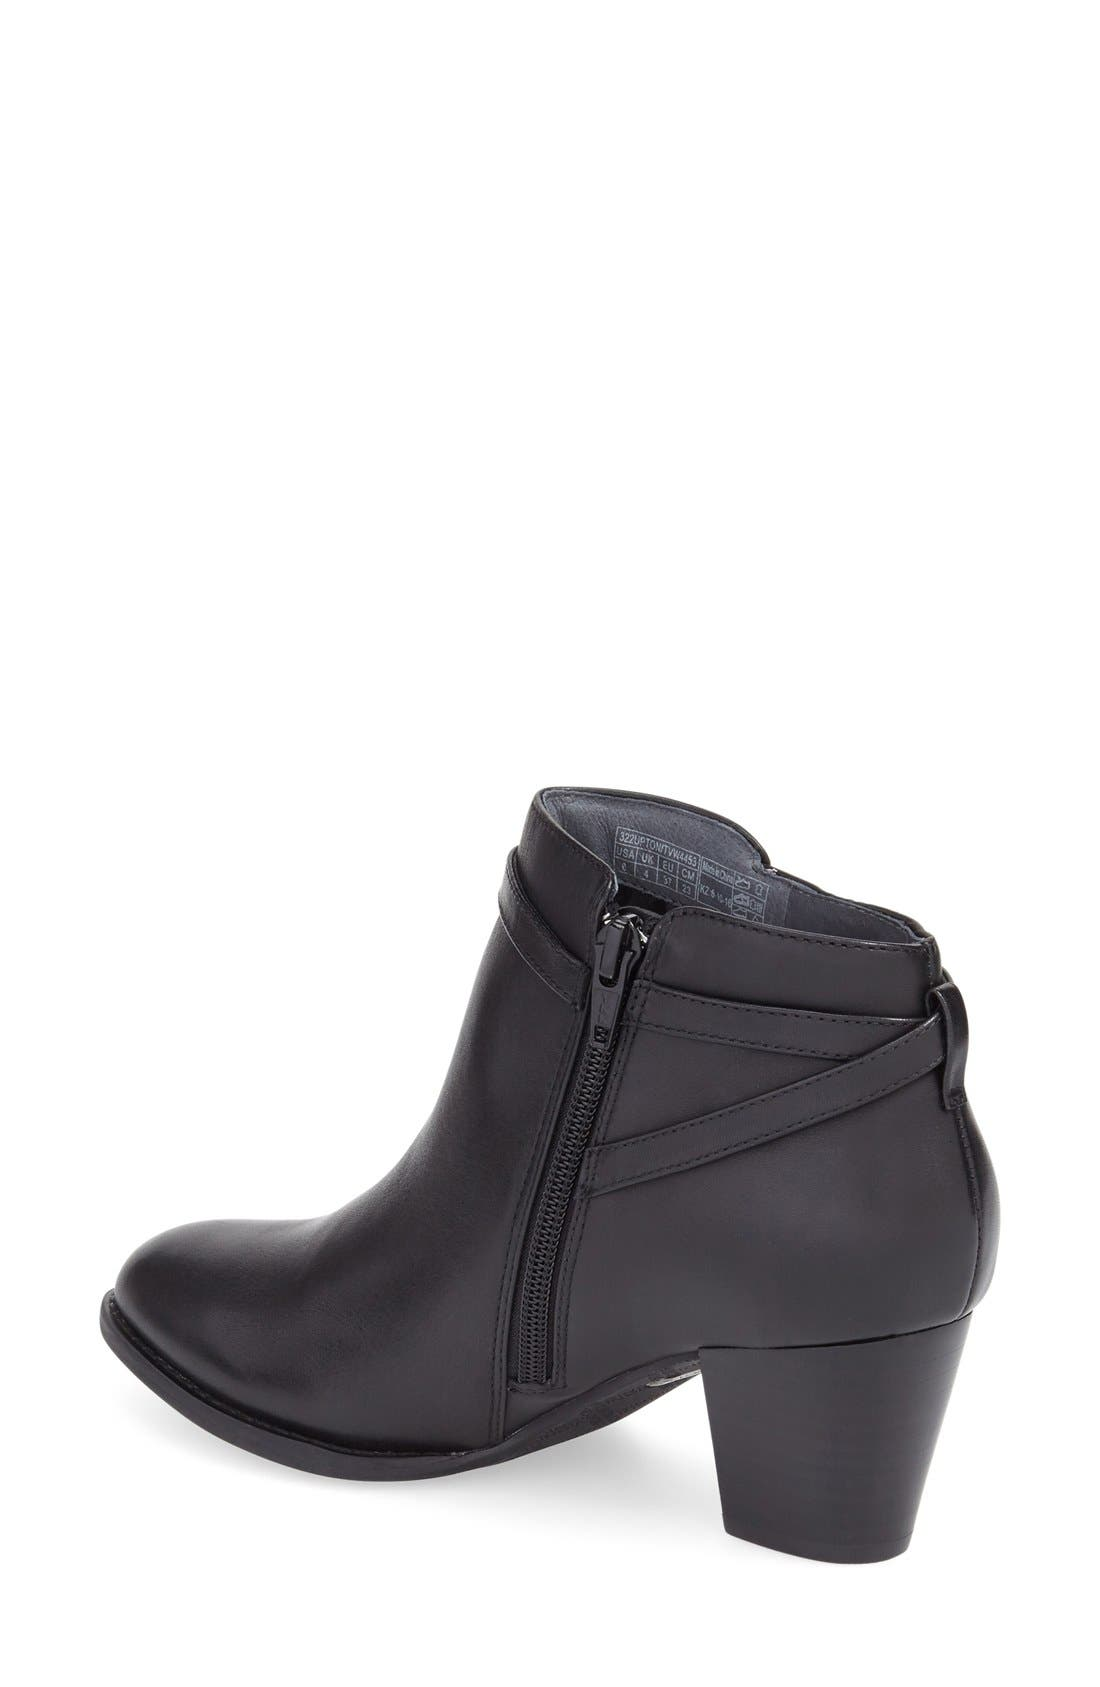 Alternate Image 2  - Vionic 'Upton' Block Heel Boot (Women)